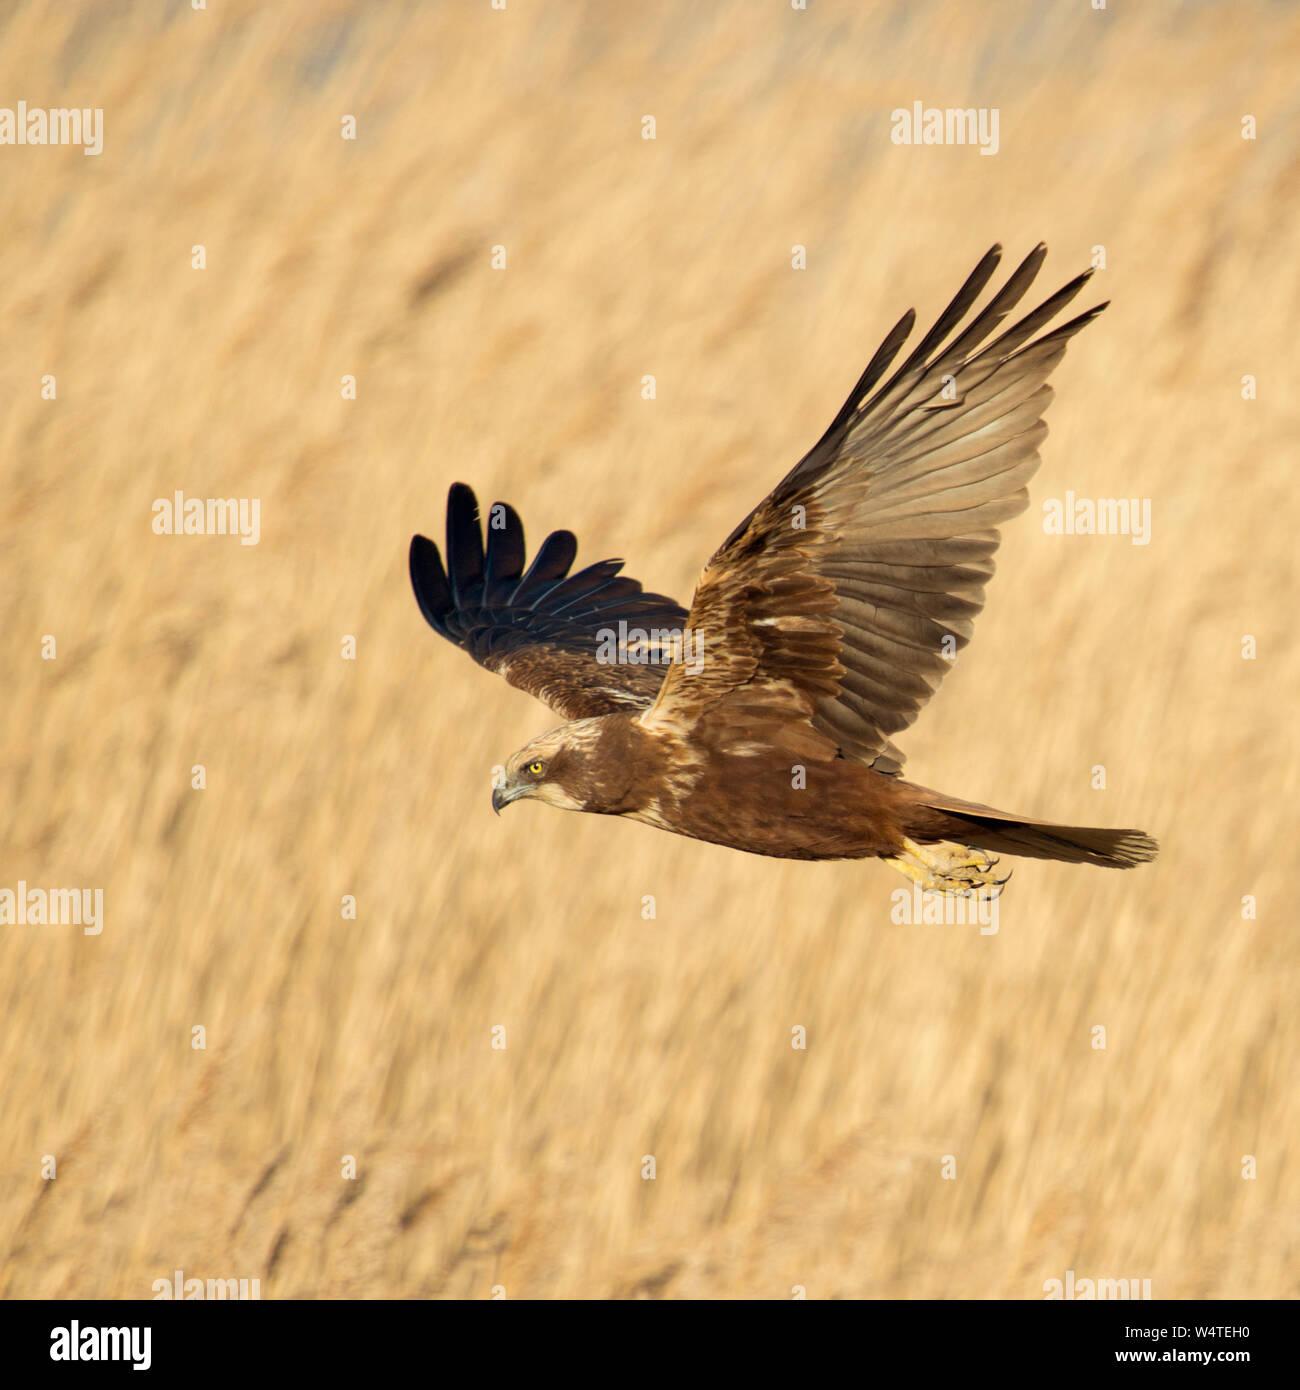 Western Marsh Harrier / Rohrweihe ( Circus aeruginosus ) in flight, searching for prey, flying over golden reed, Netherlands, Europe. Stock Photo